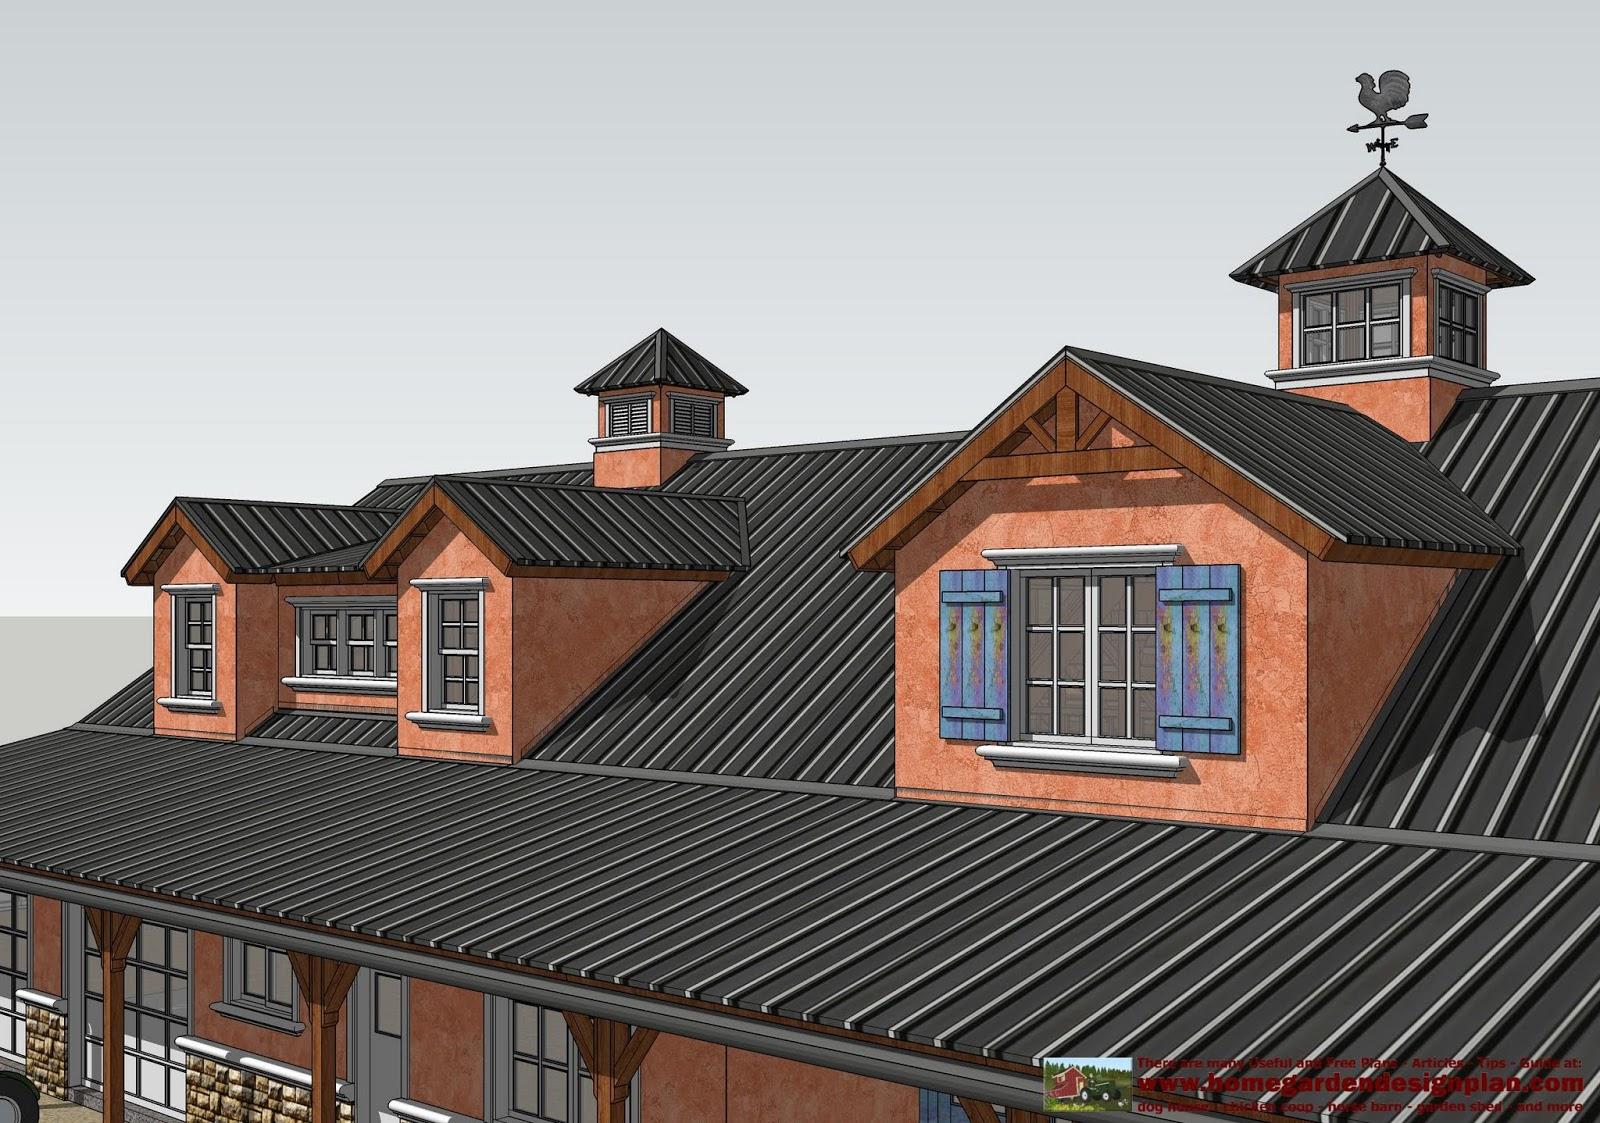 Home garden plans hb100 horse barn plans horse barn for Horse barn designs free